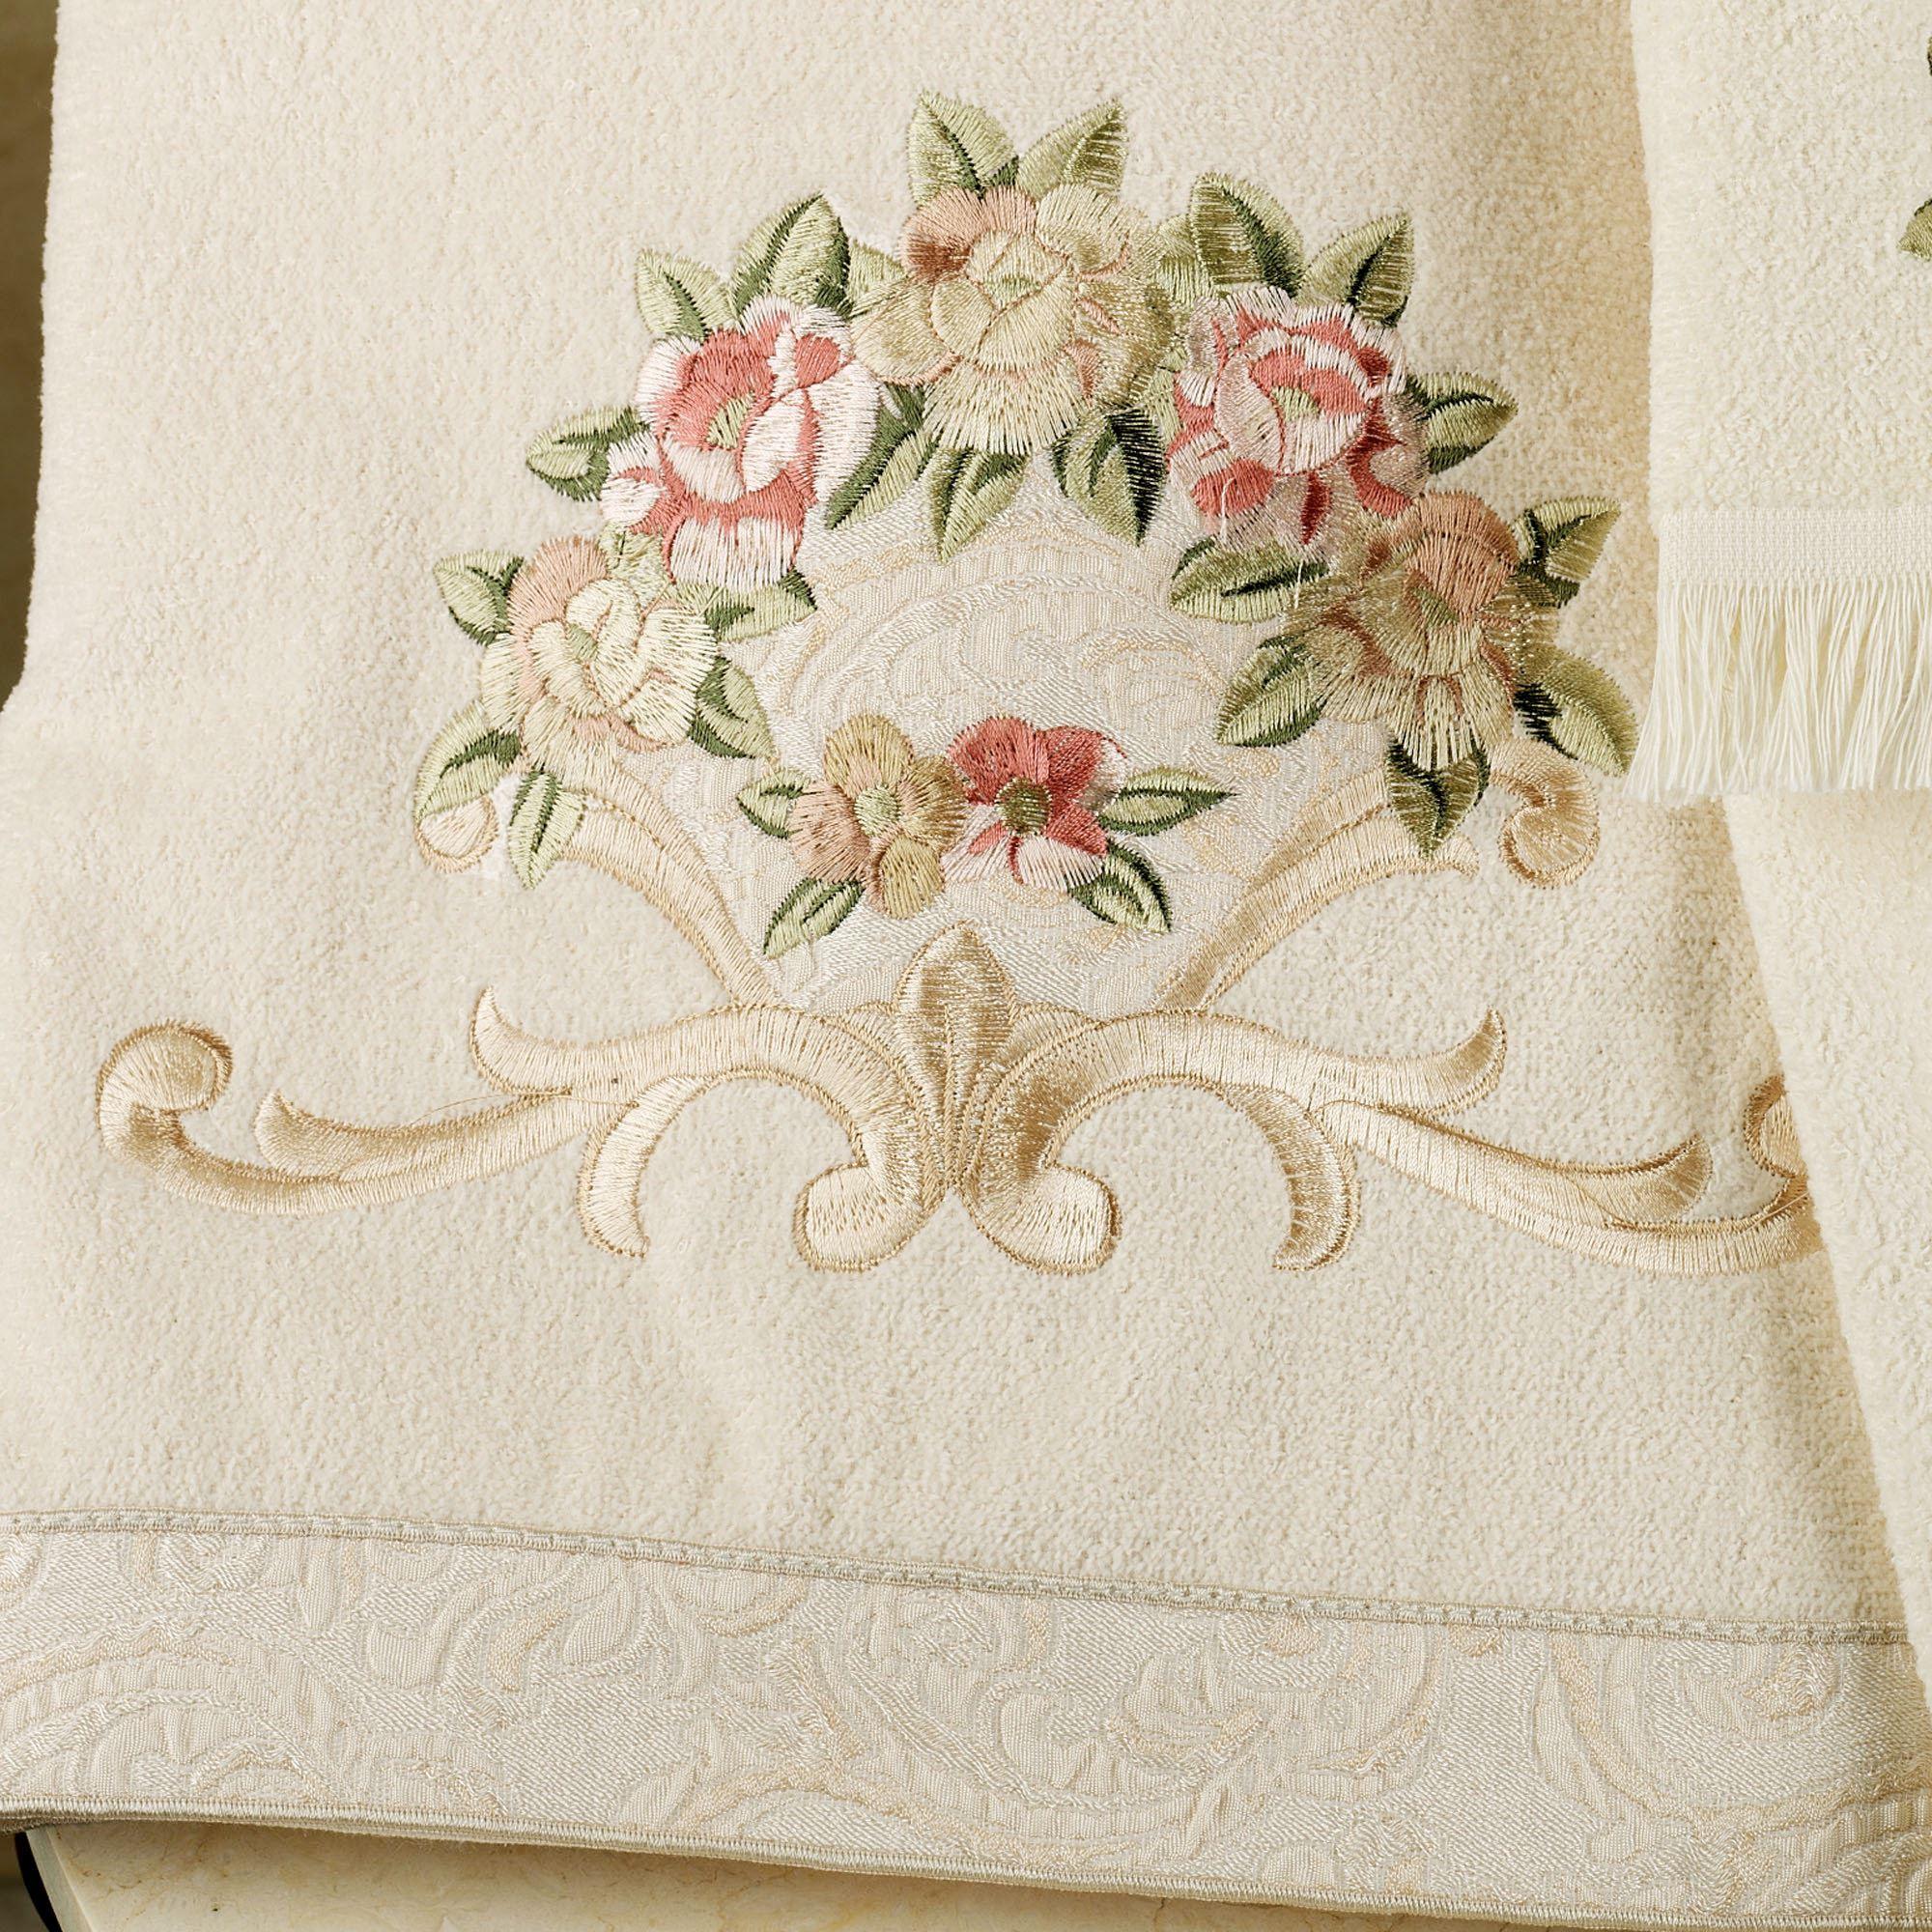 Вышивка на бамбуковом банном полотенце